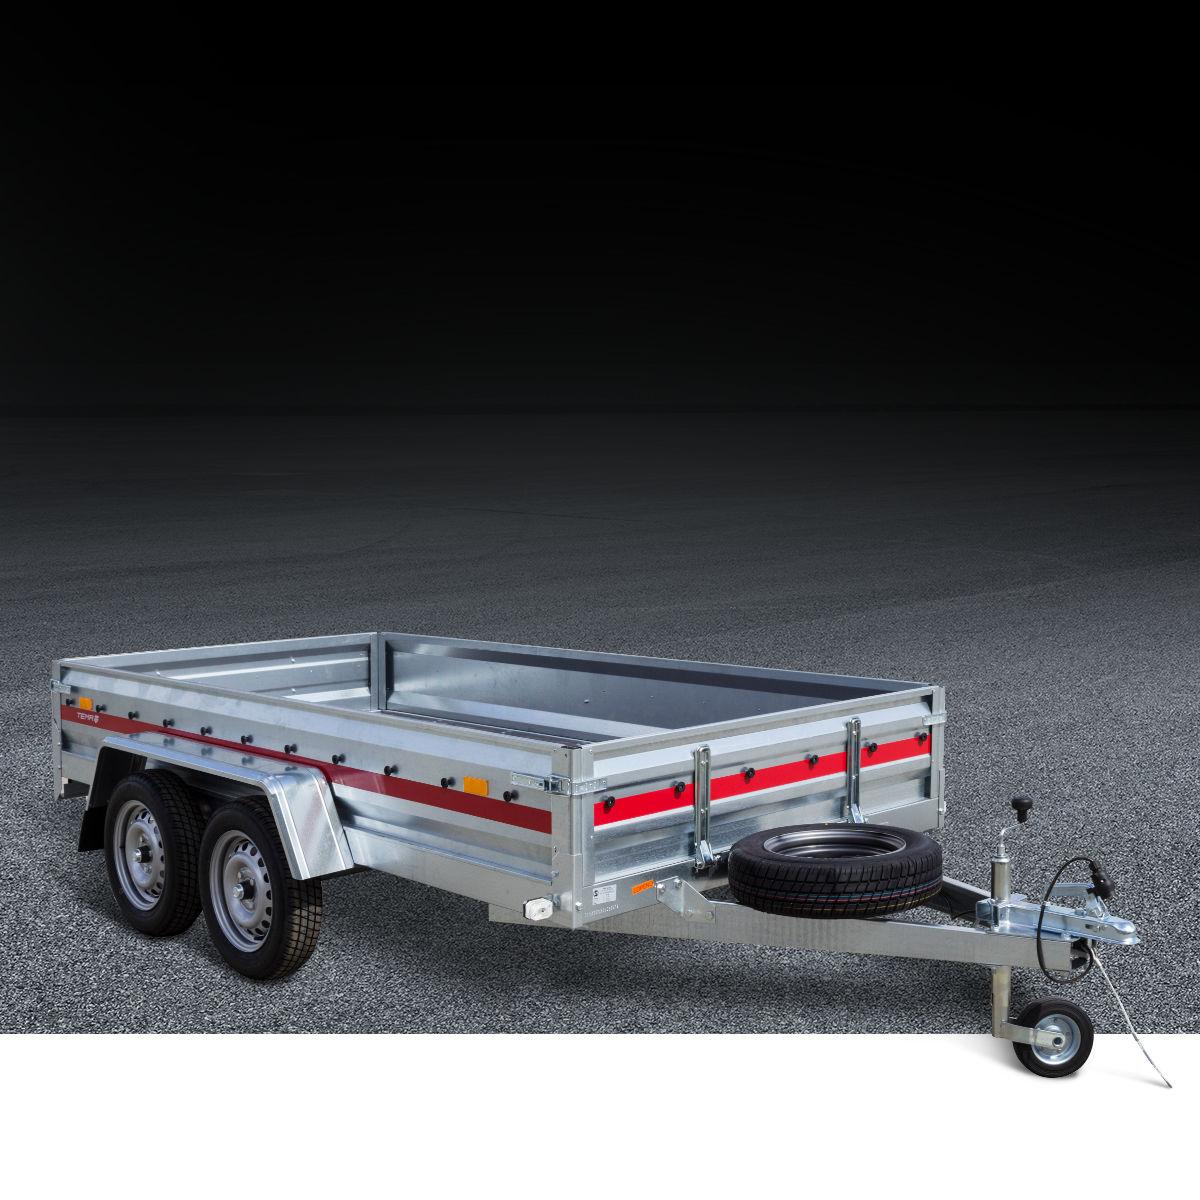 Auto prikolice na 2 osovine do 750 kg